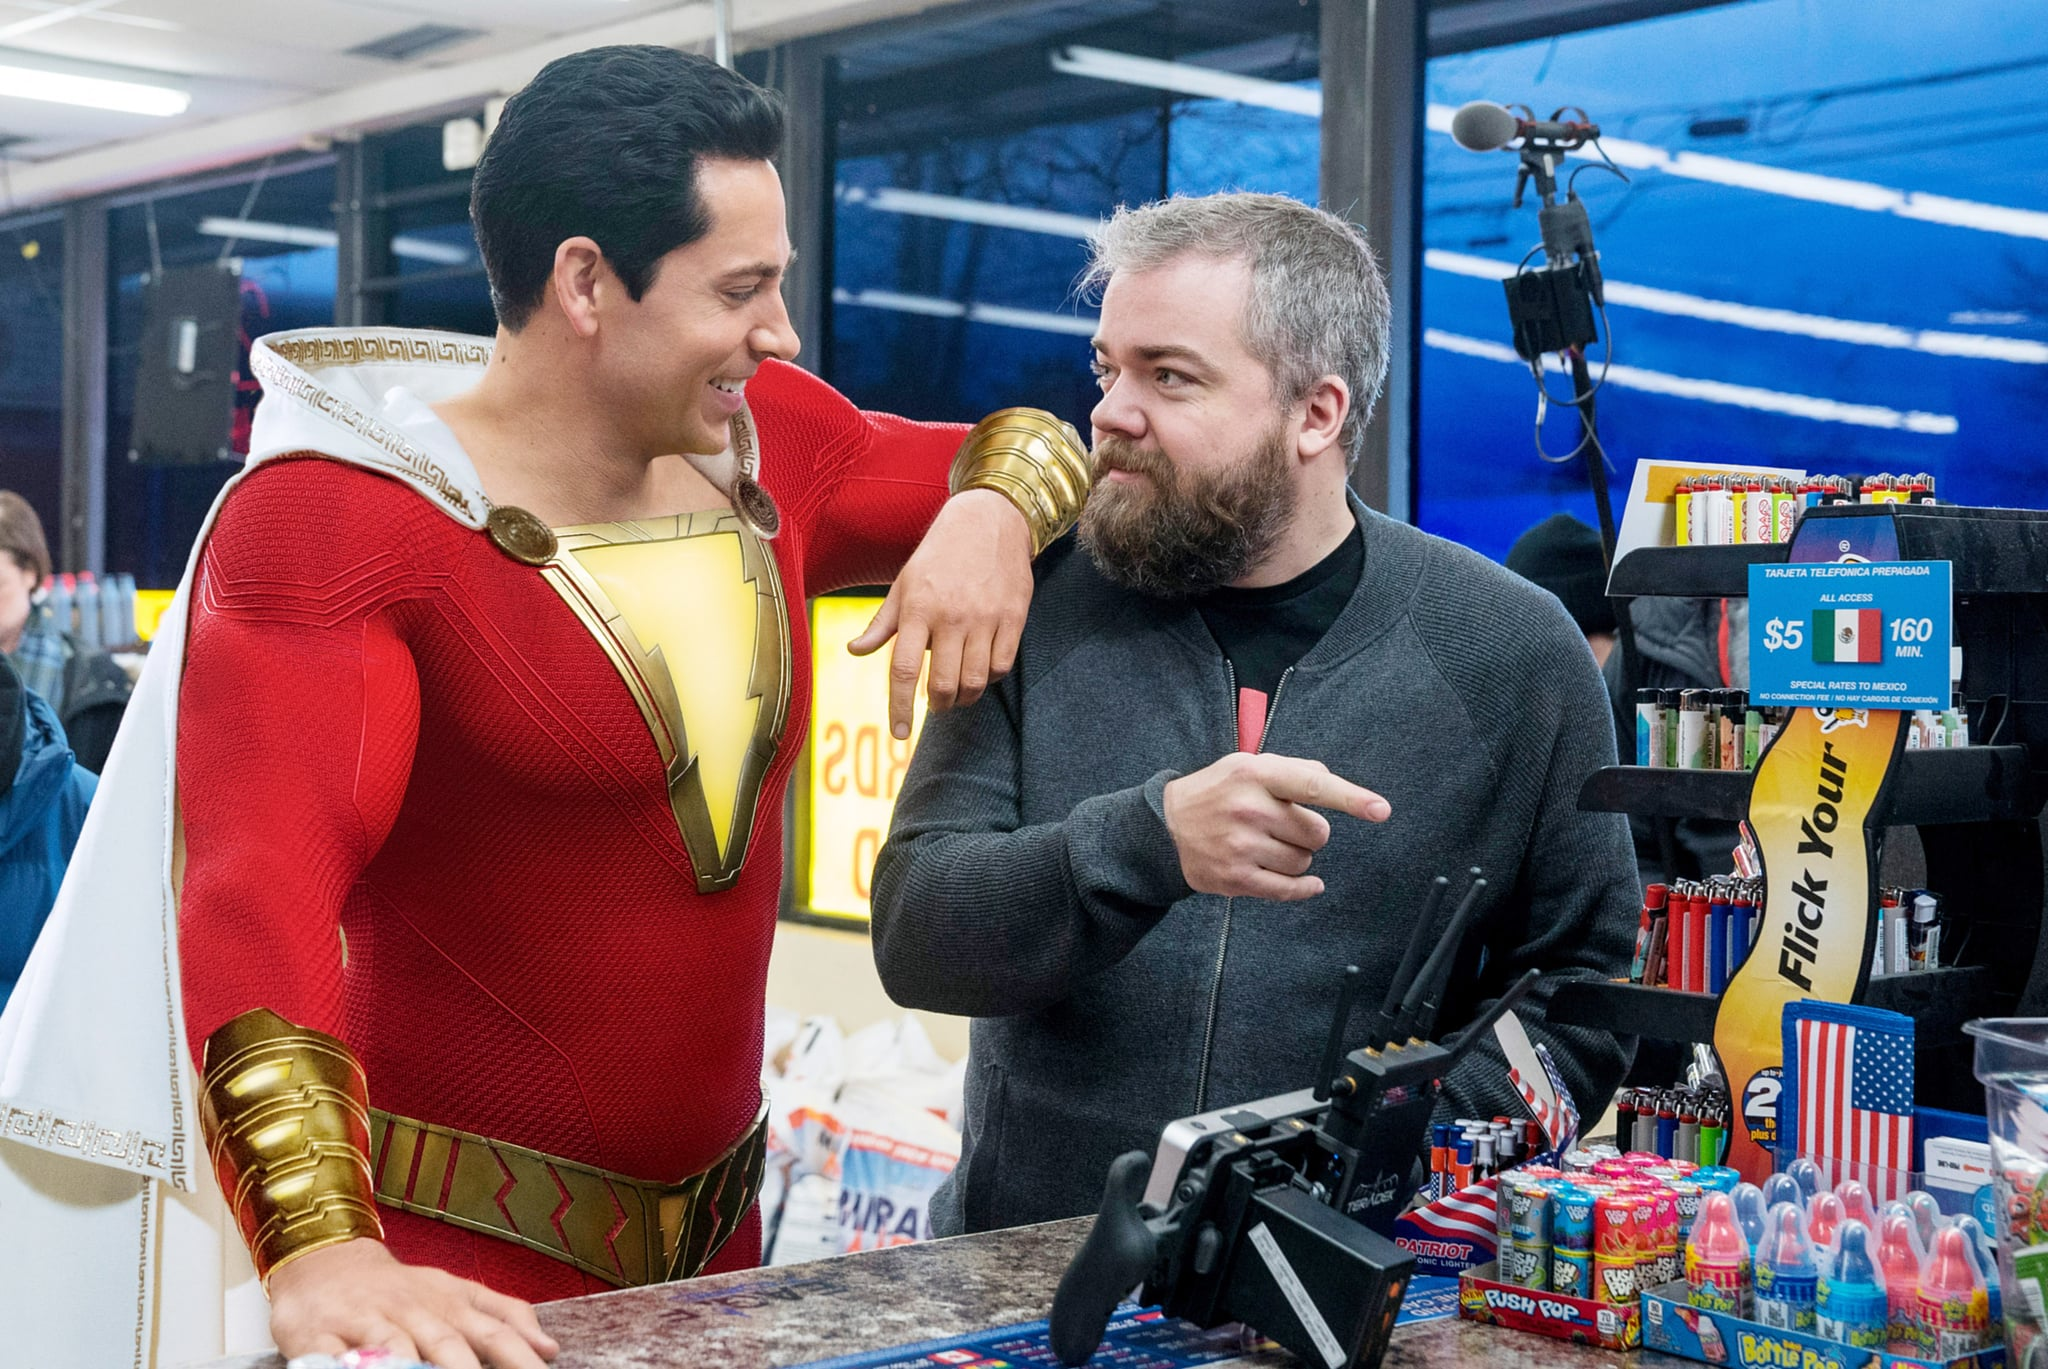 SHAZAM!, Zachary Levi (as Shazam), Director David F. Sandberg, on-set, 2019. ph: Steve Wilkie /  Warner Brothers / Courtesy Everett Collection